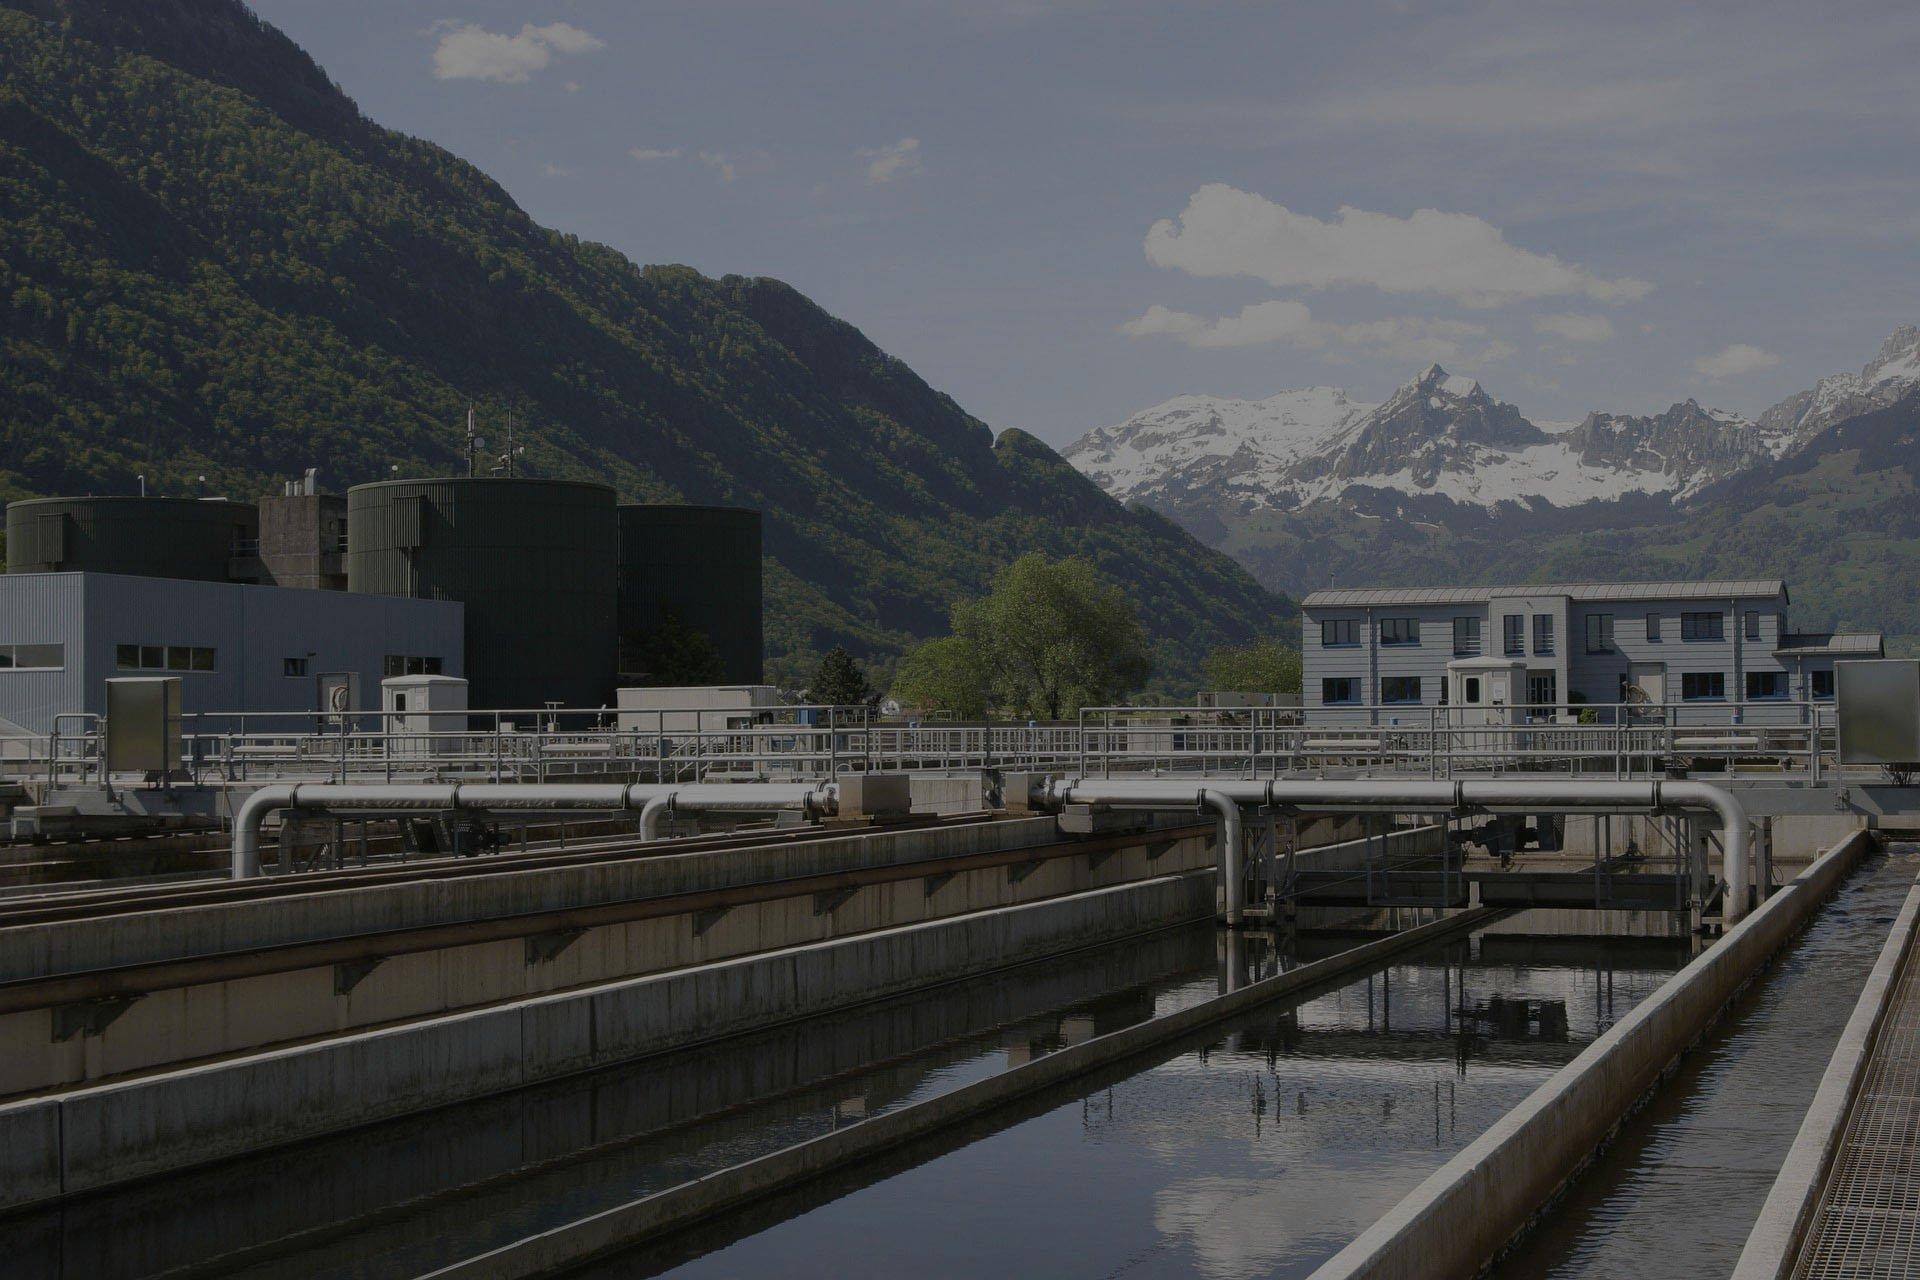 sewage-plant-4337156_1920-min copy-1